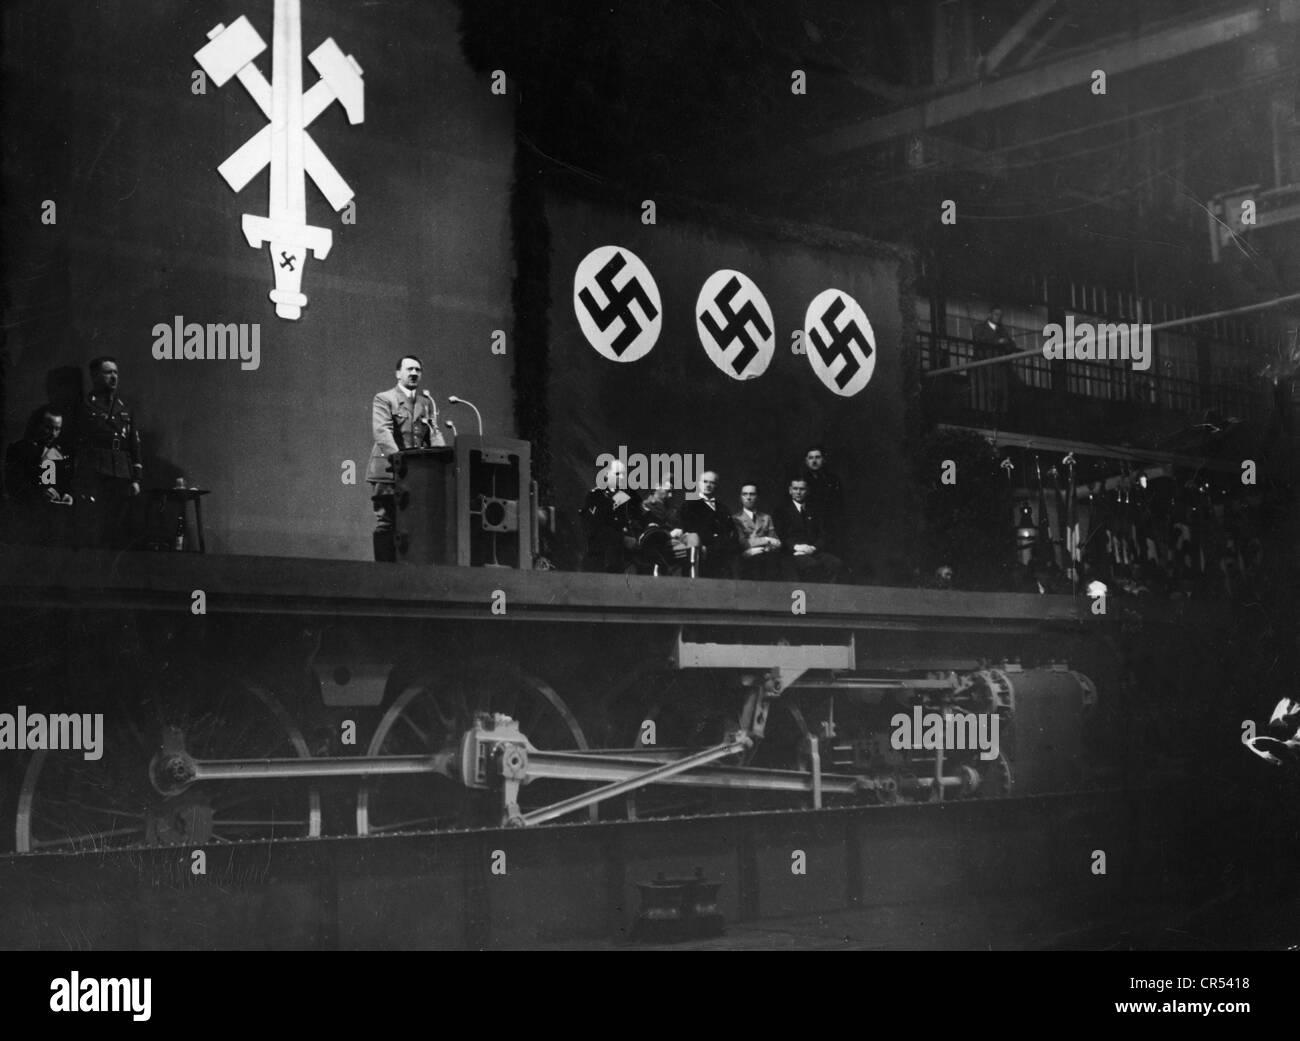 Hitler, Adolf, 20.4.1889 - 30.4.1945, German politician (NSDAP), Fuehrer and Reich Chancellor since 1933, speech - Stock Image